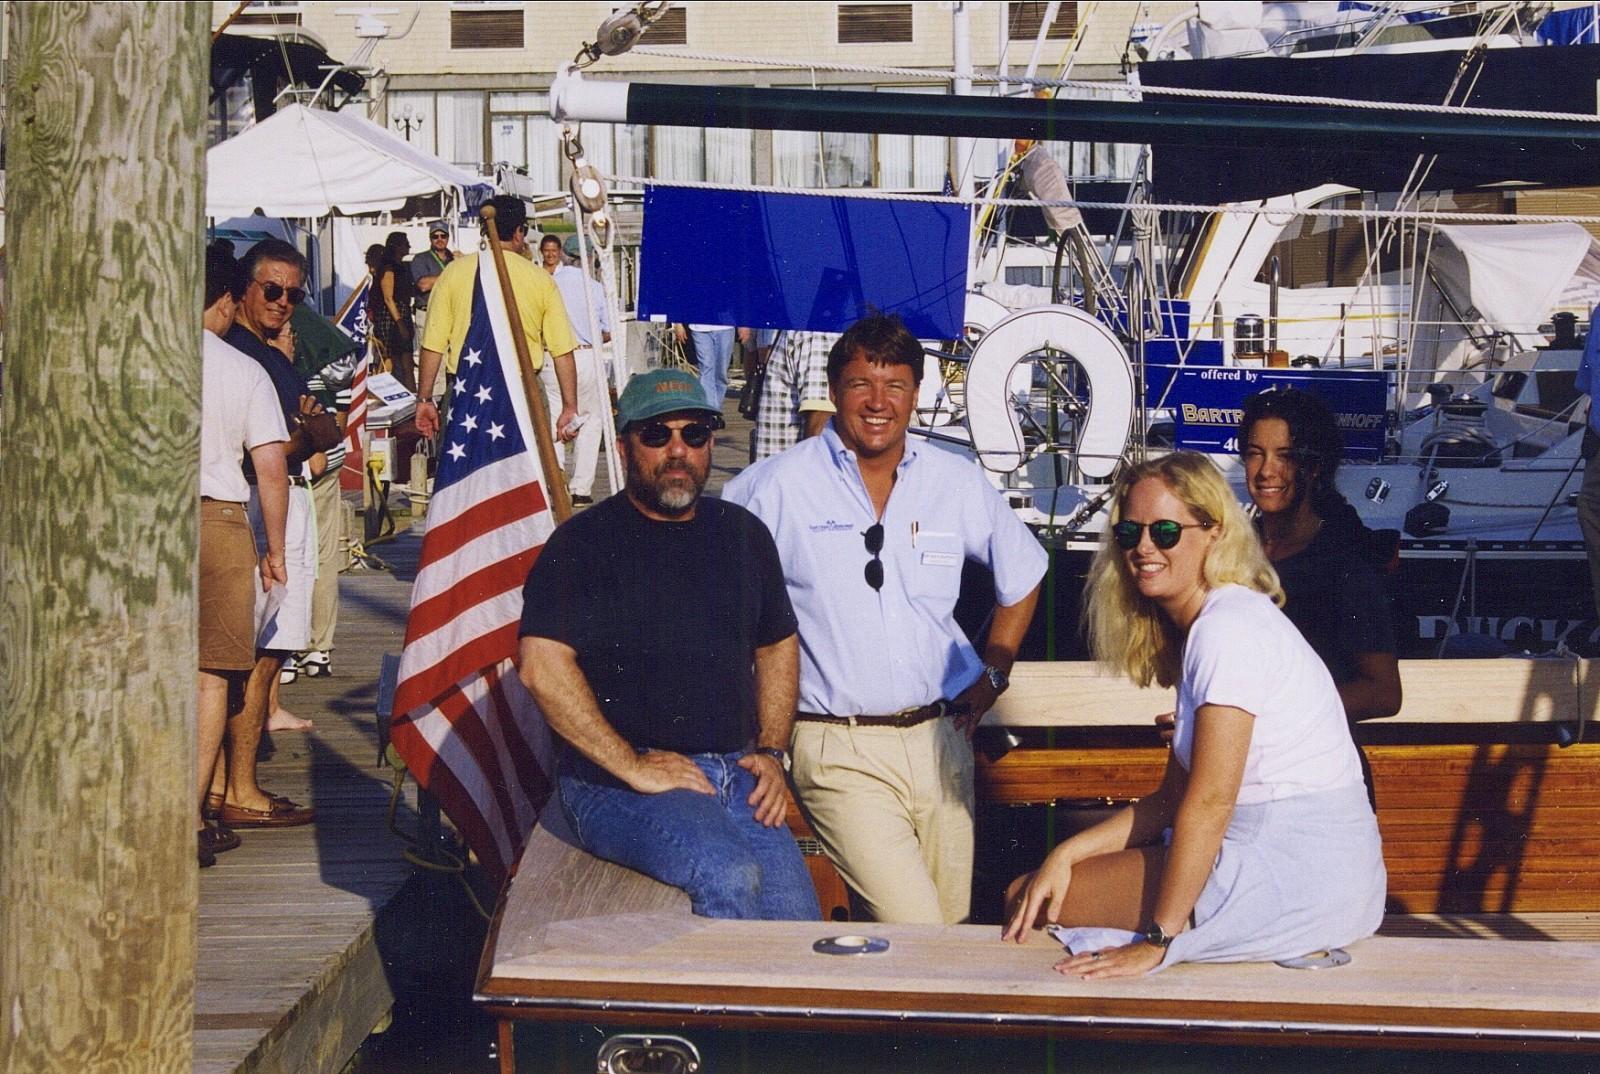 Billy Joel, David Lacz, Karin Hill and Julie Miller in an undated photo taken in Newport, RI.